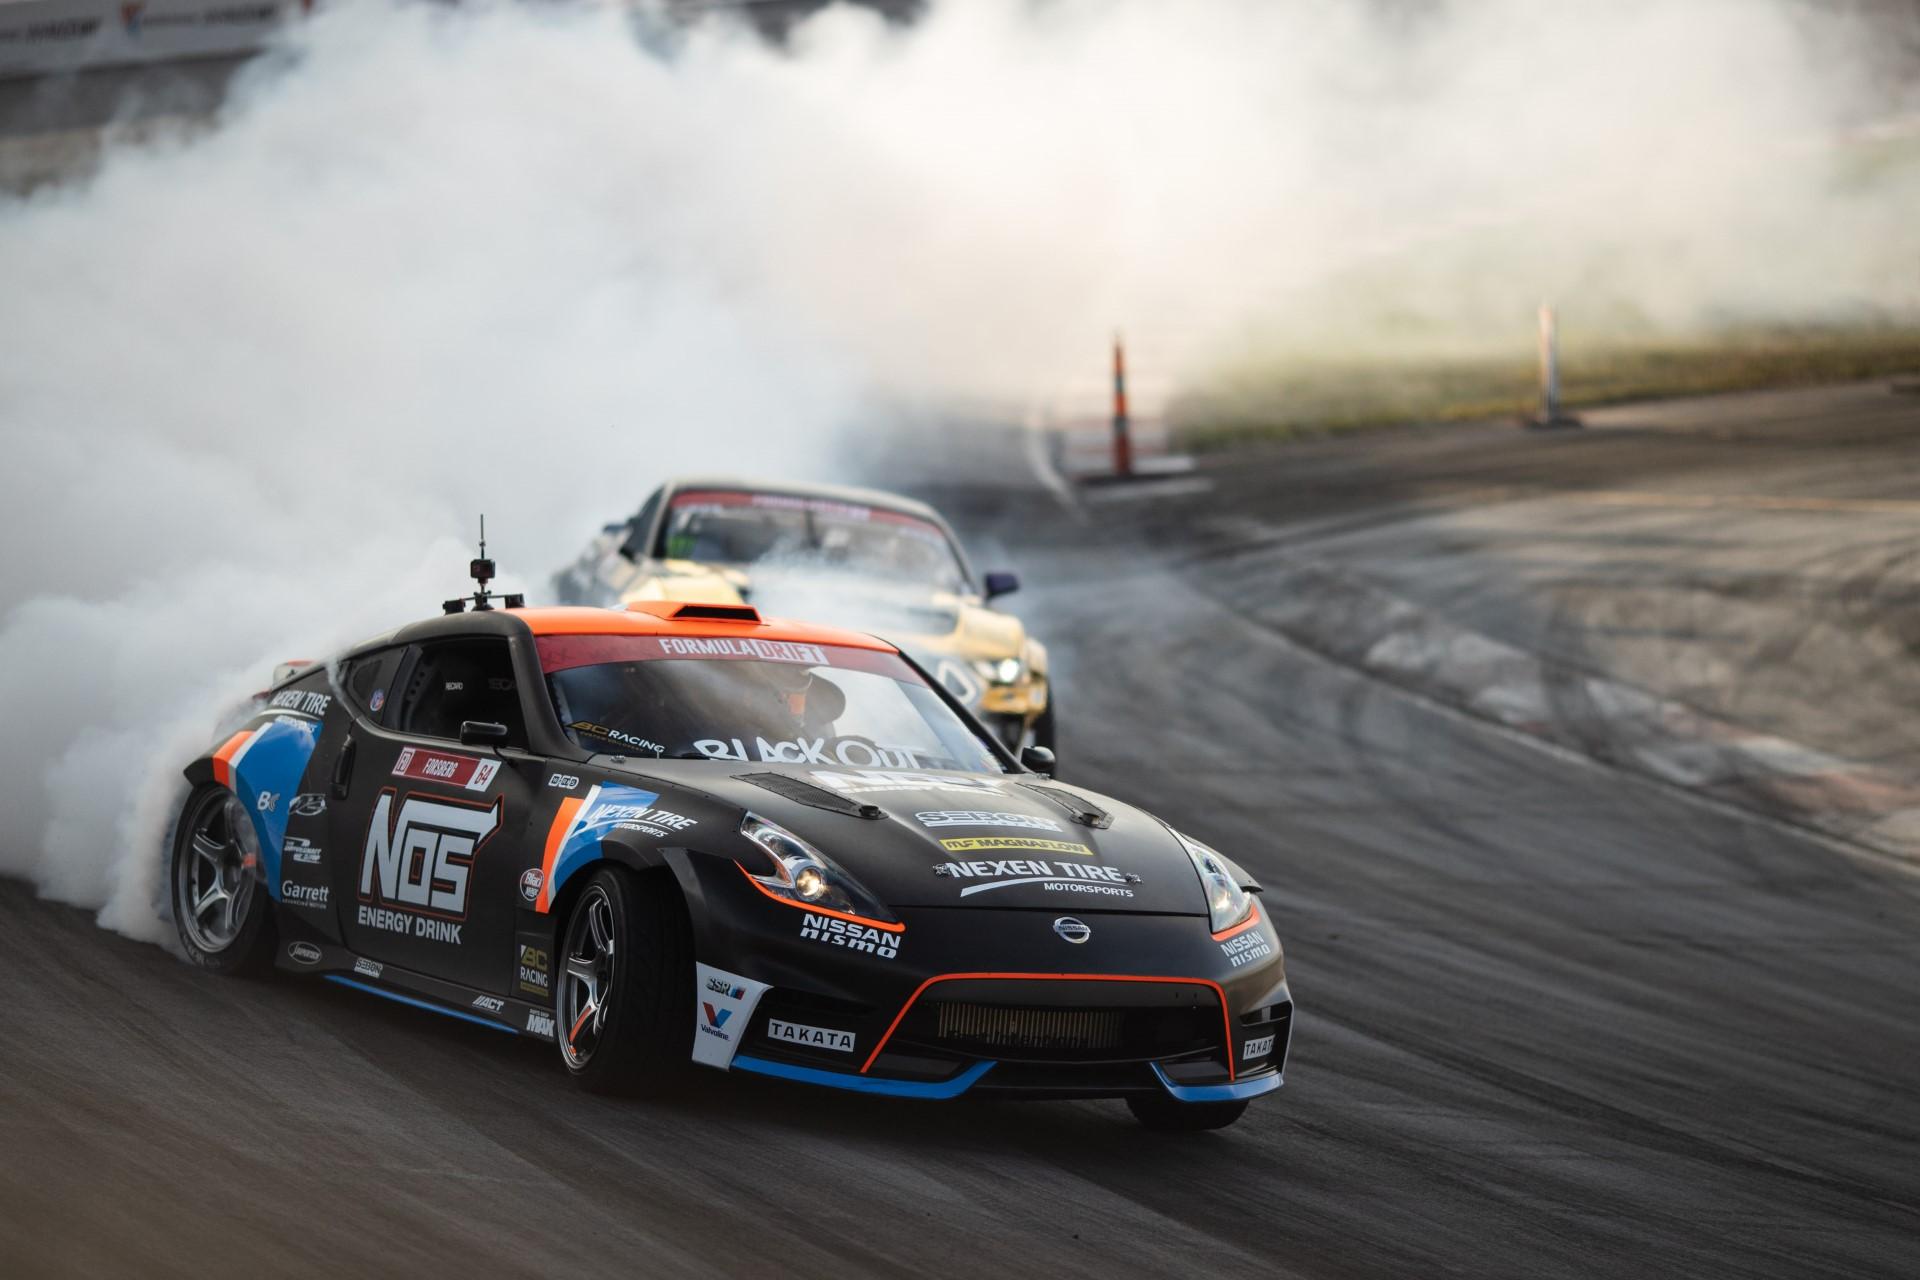 bc-racing-na-chris-forsberg-7880